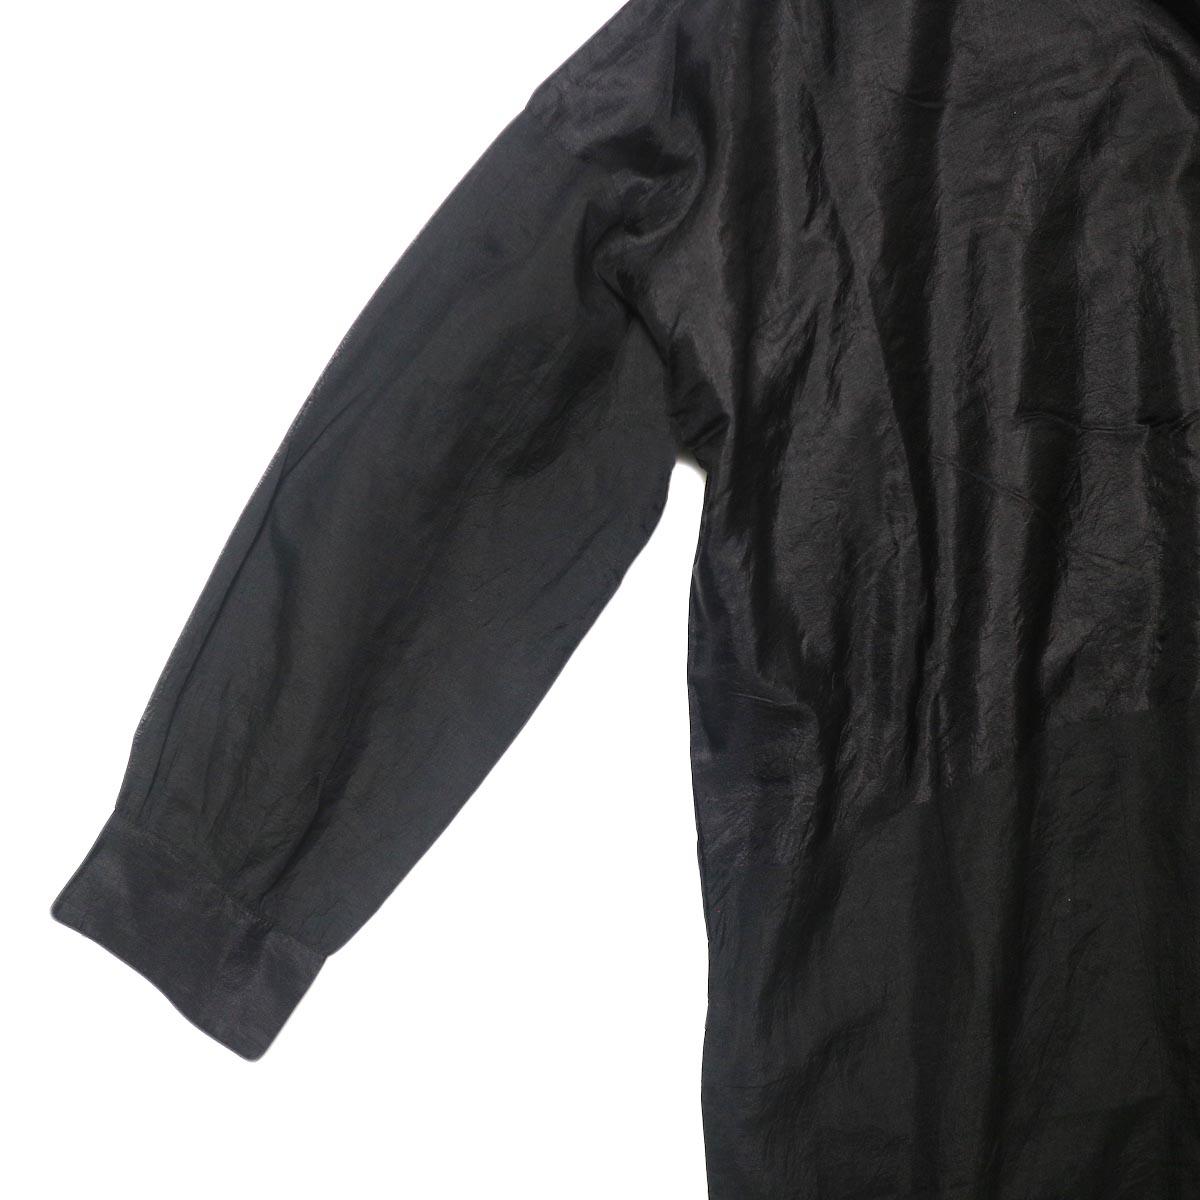 maison de soil / HAND WOVEN COTTON SILK × SILK PLAIN DROP SHOULDER DRESS (black) 素材切替アップ